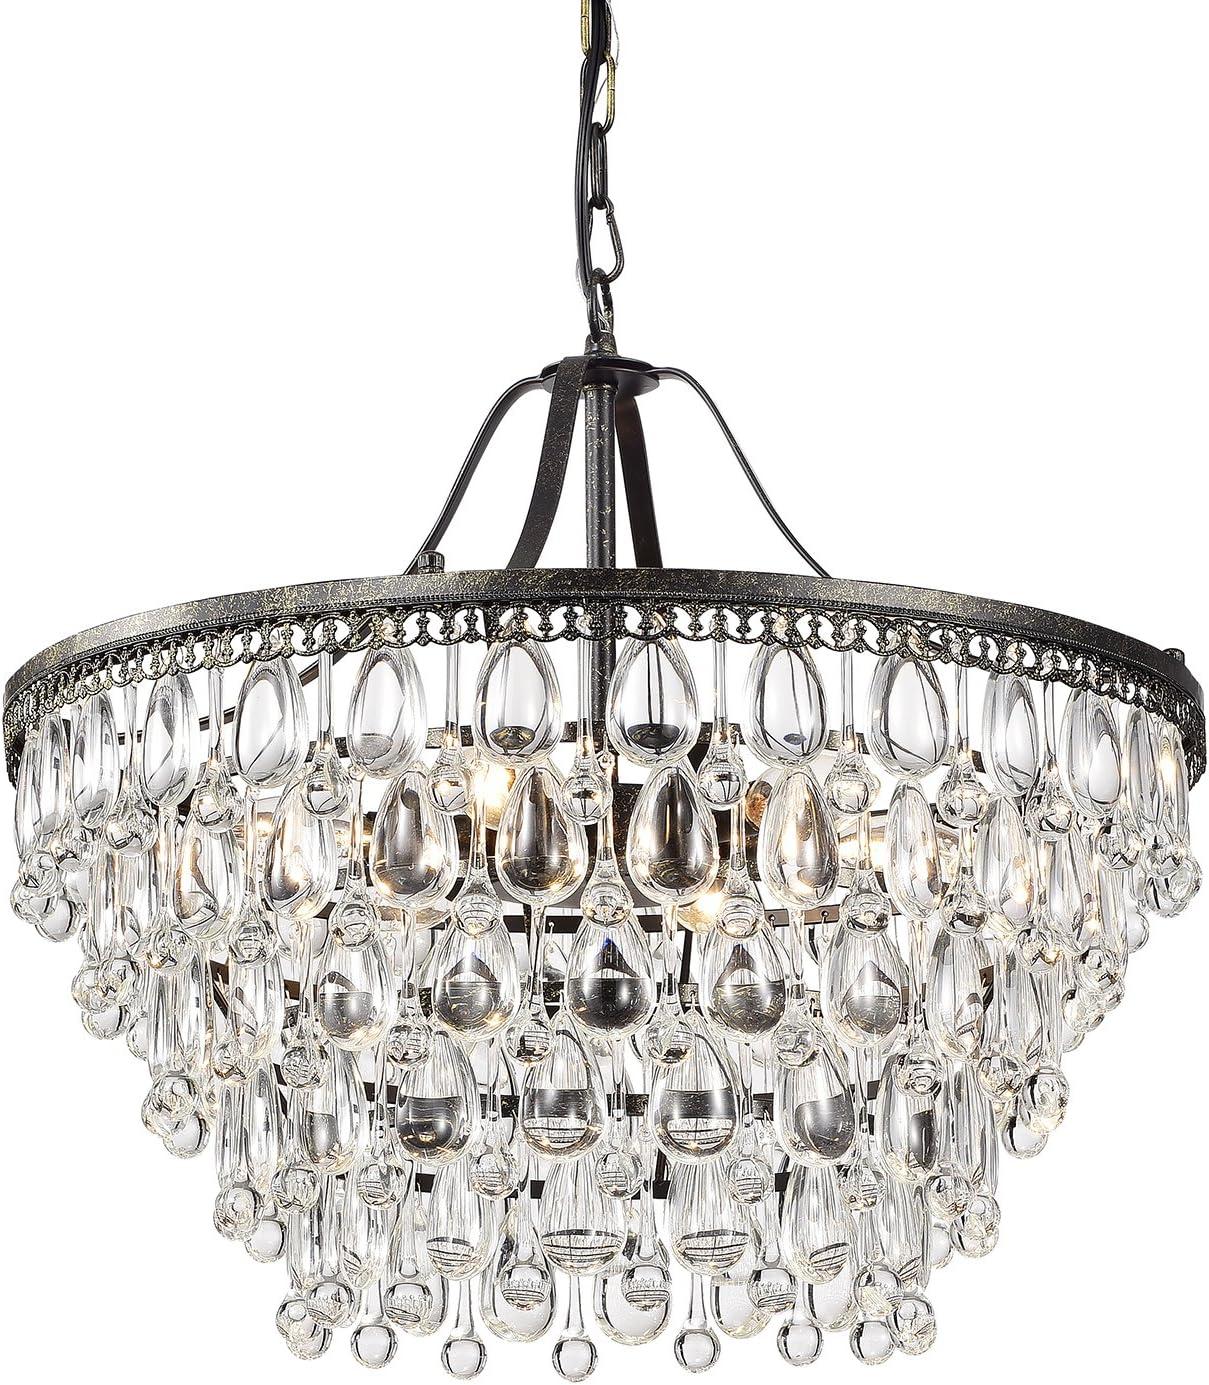 Edvivi 6-Light Antique Bronze Chandelier with Crystals Glam Lighting